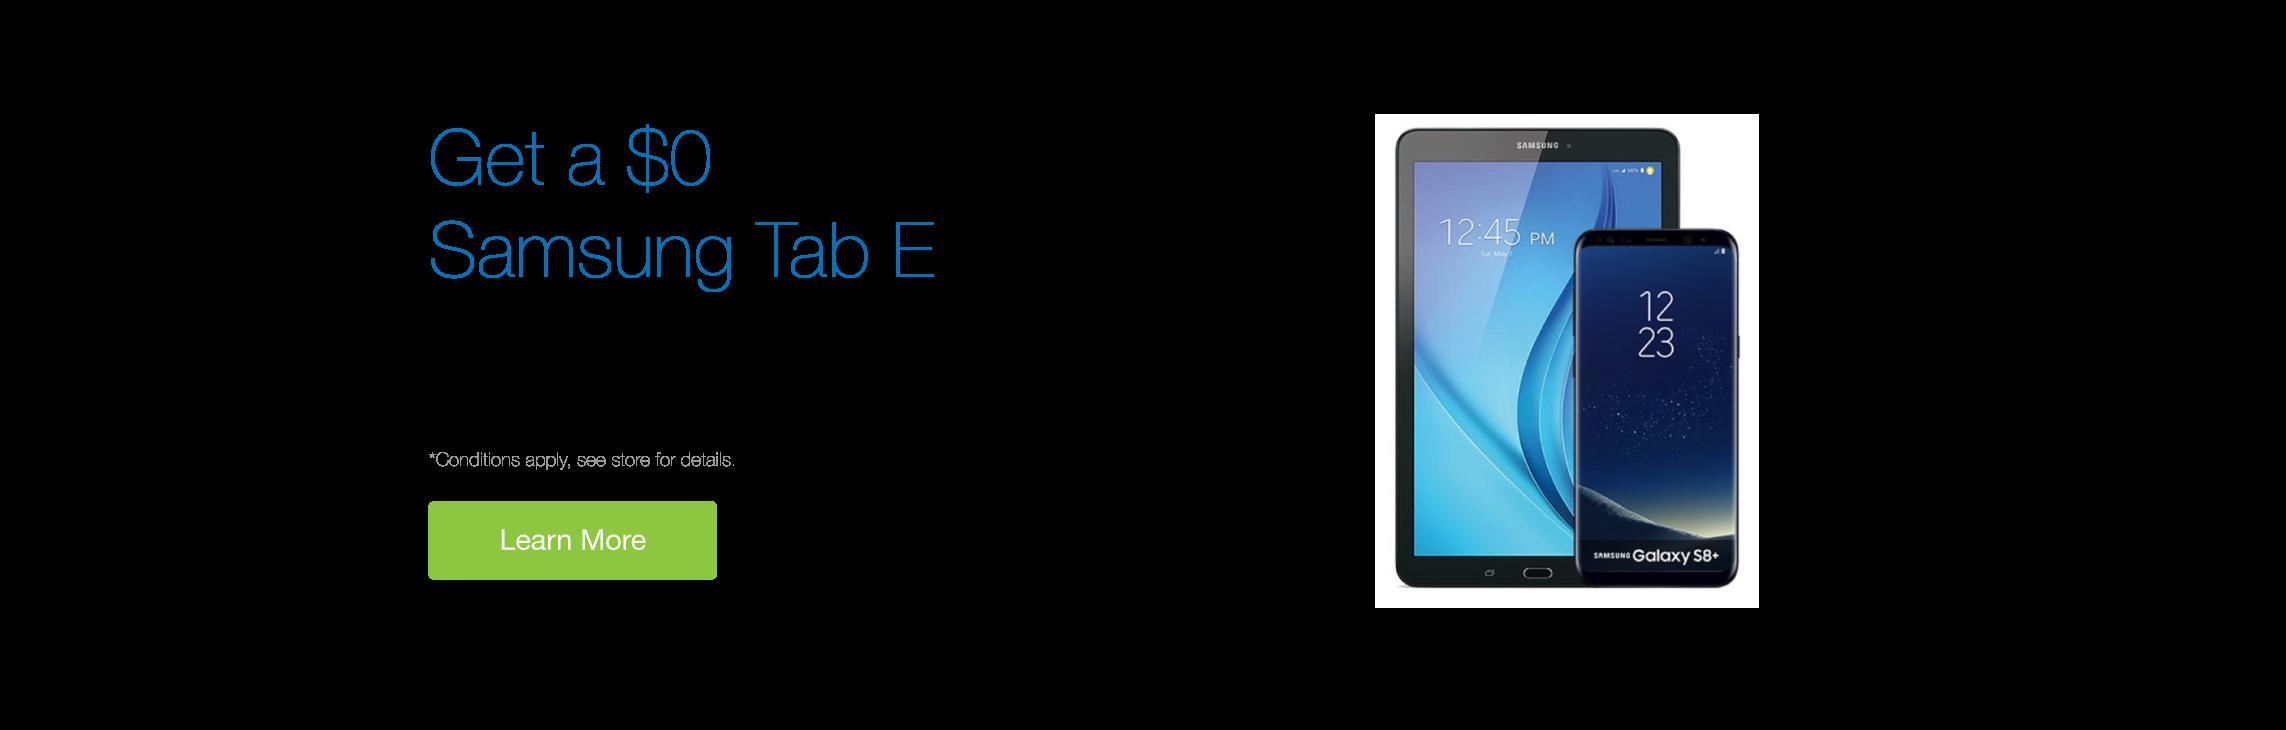 Get a $0 Samsung Galaxy Tab E with the Galaxy S8